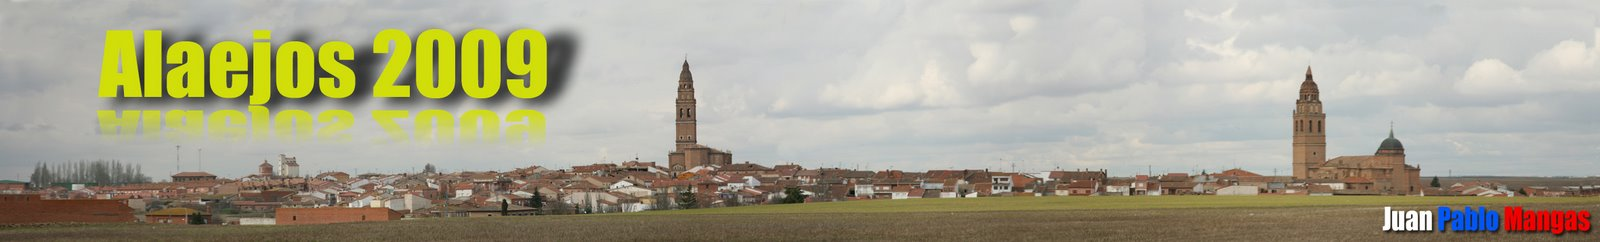 Alaejos 2009